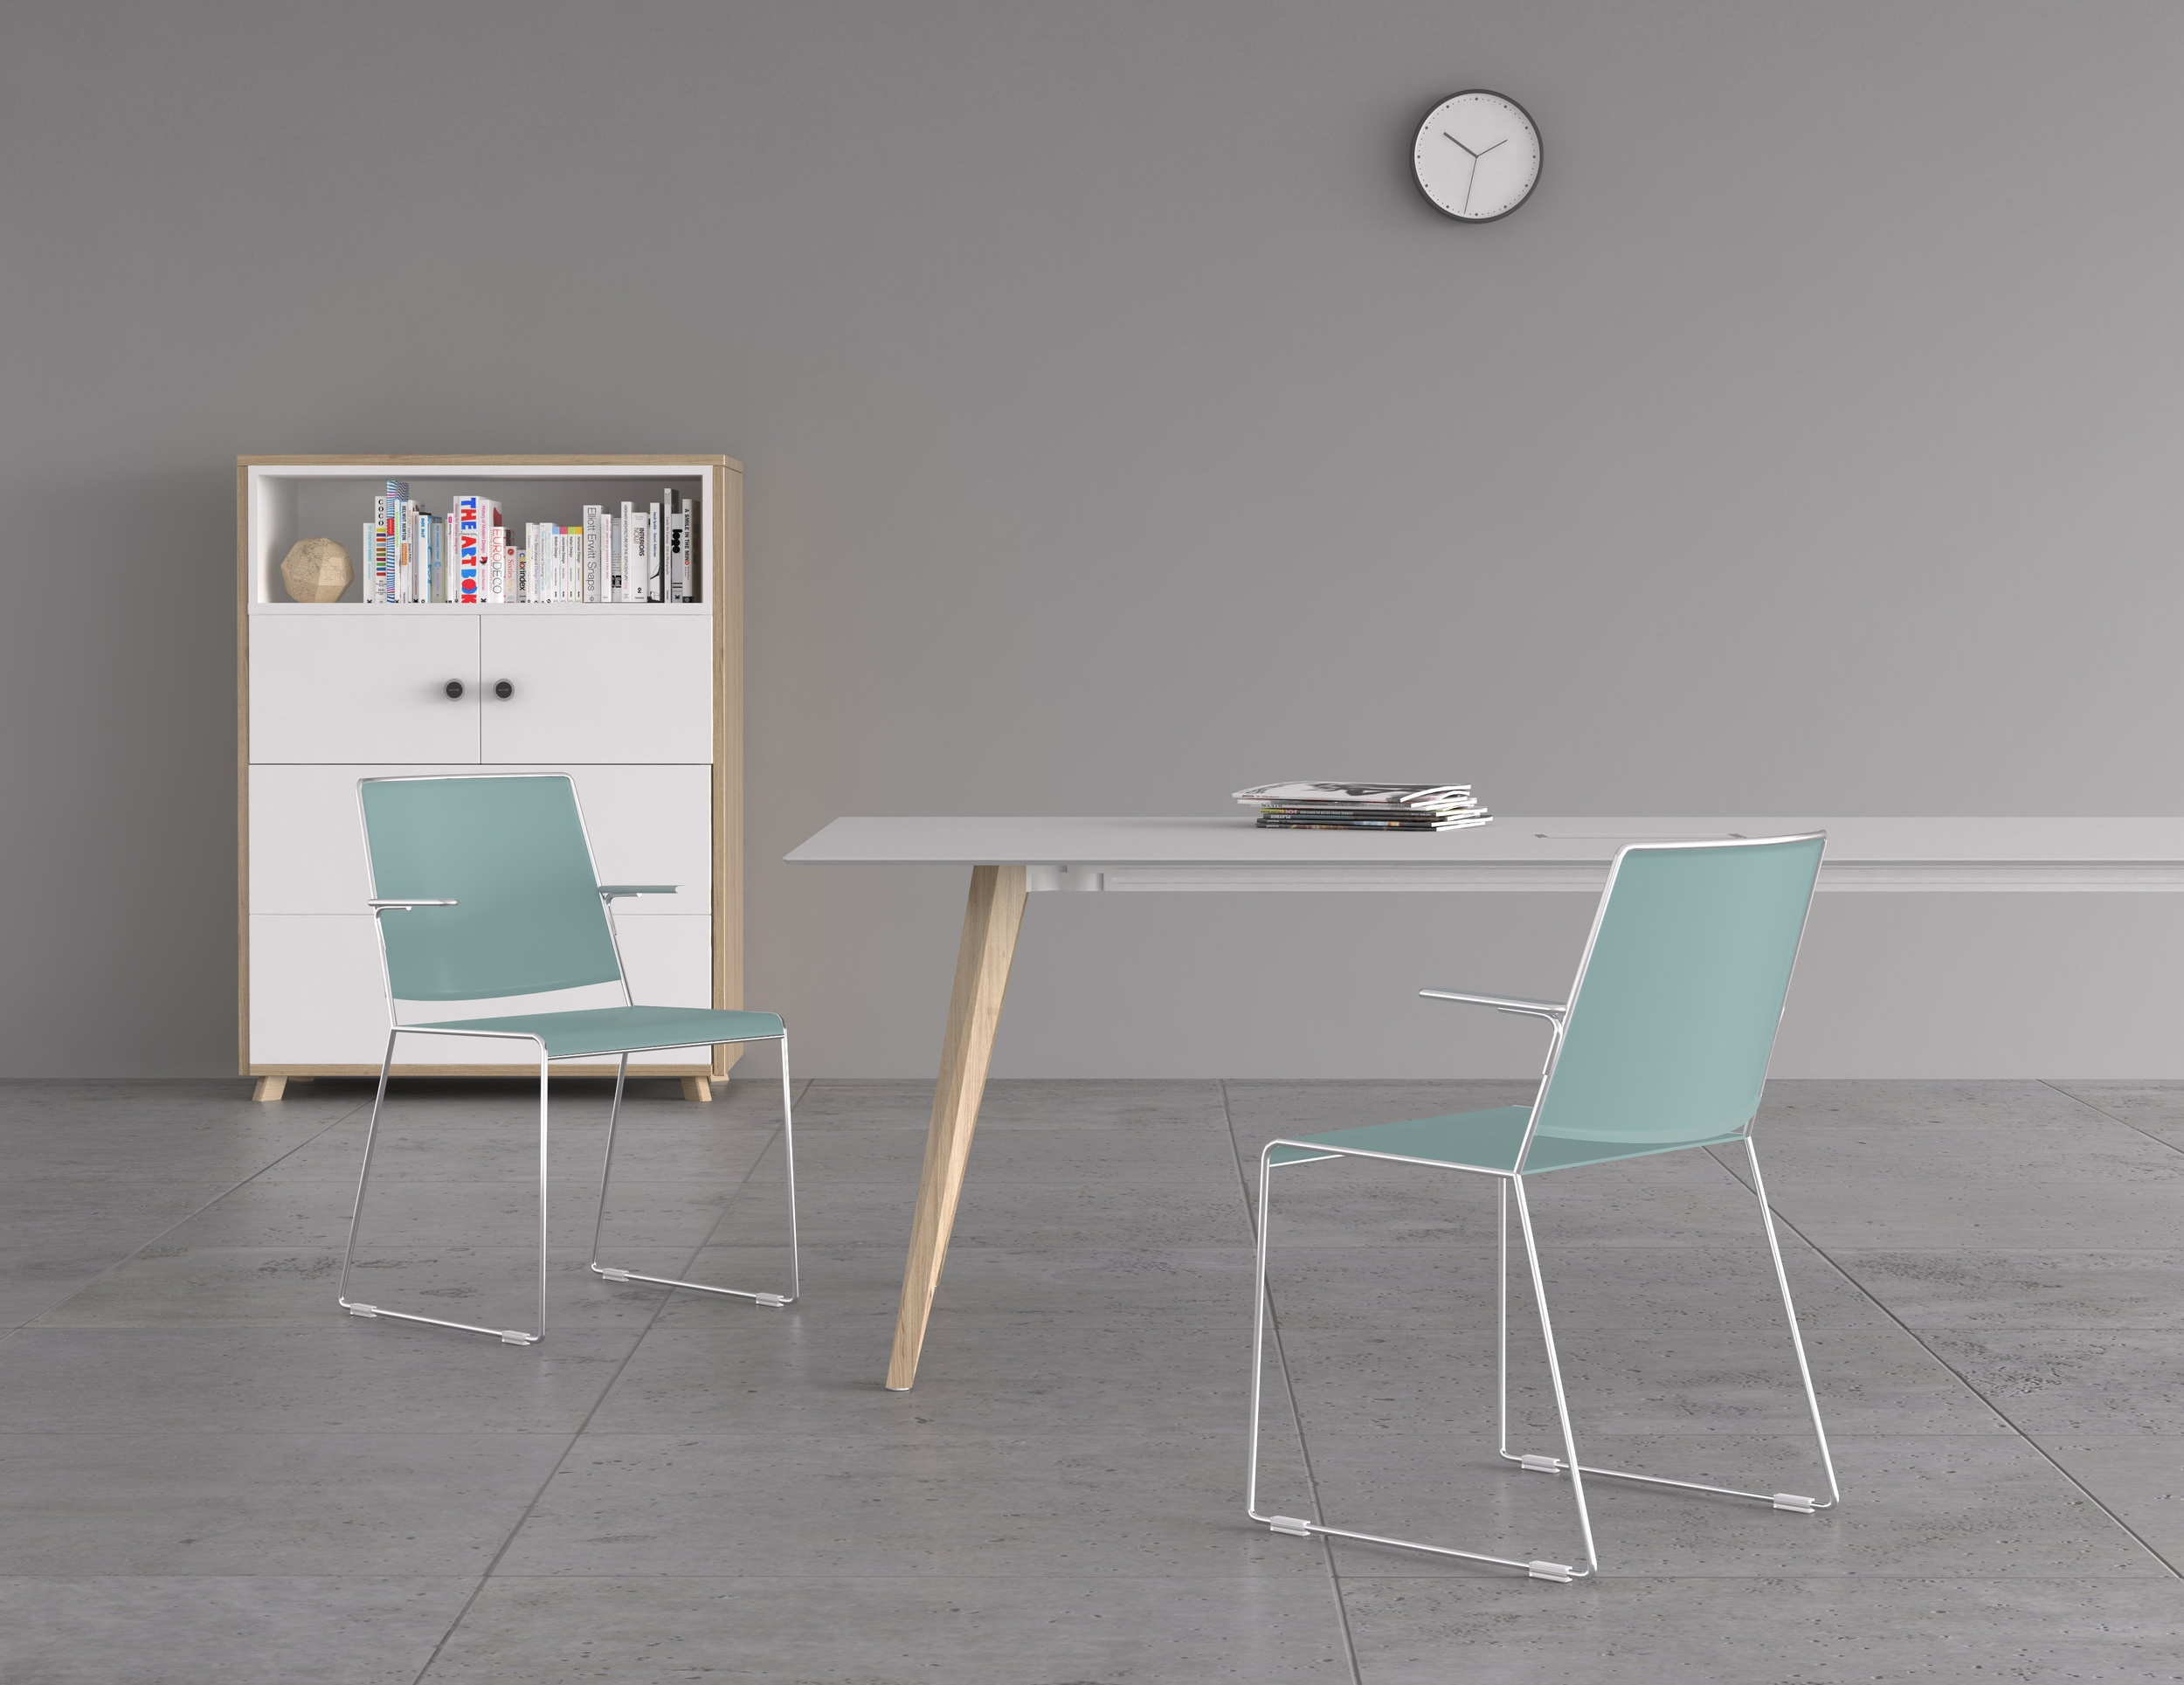 Fin chair, Bevel table, Versatile storage